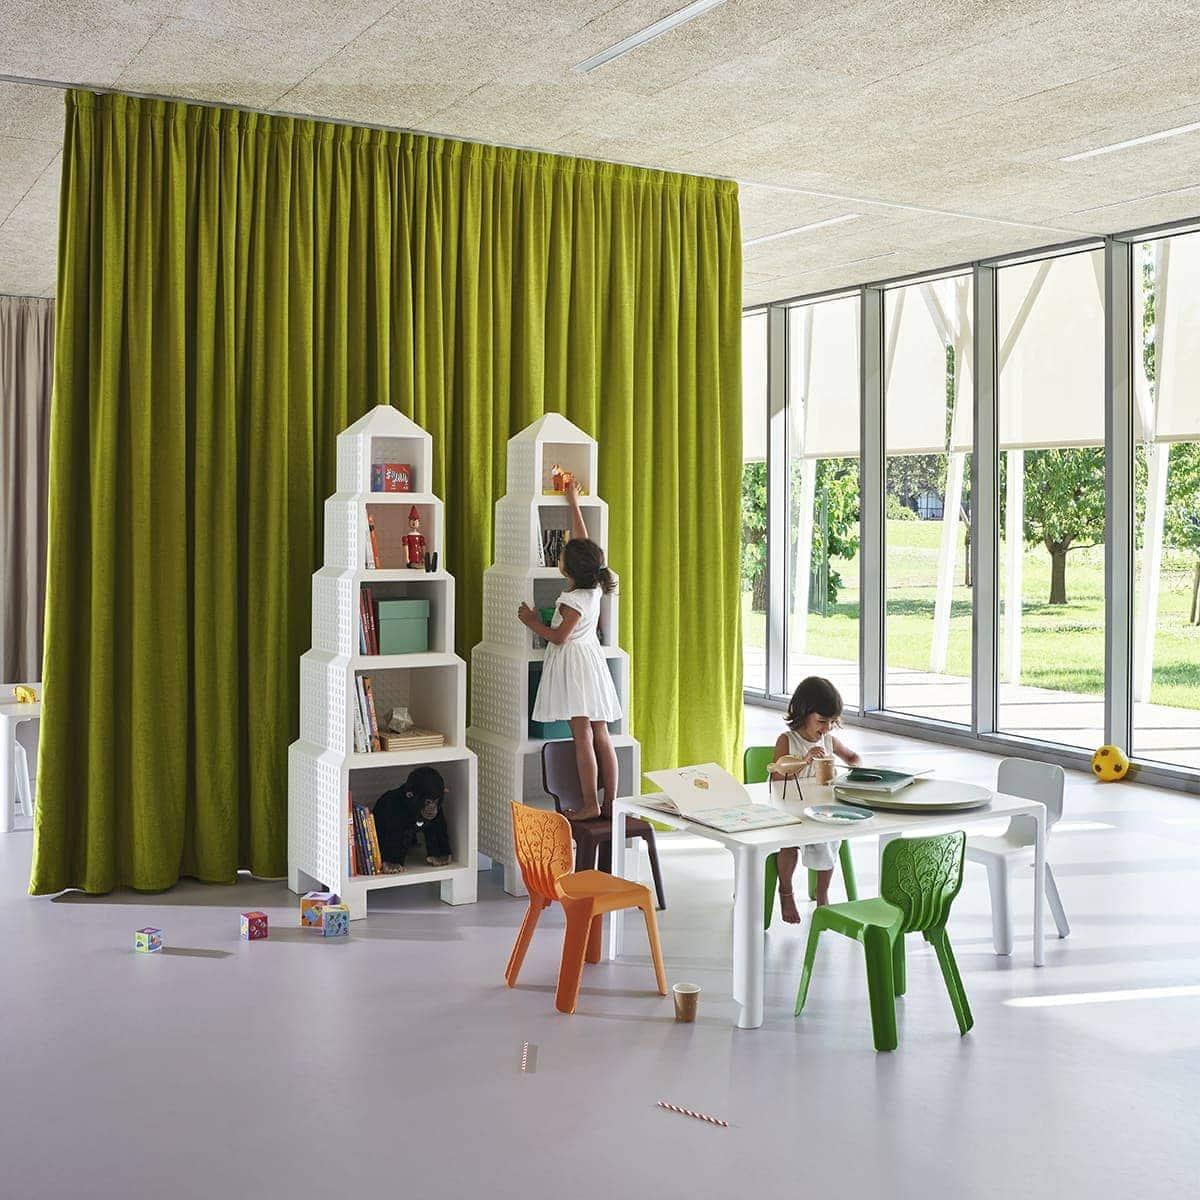 Cadeira Alma Magis® Original &Bull; Cadeira Infantil Empilhável - 1 &Bull; Deezign